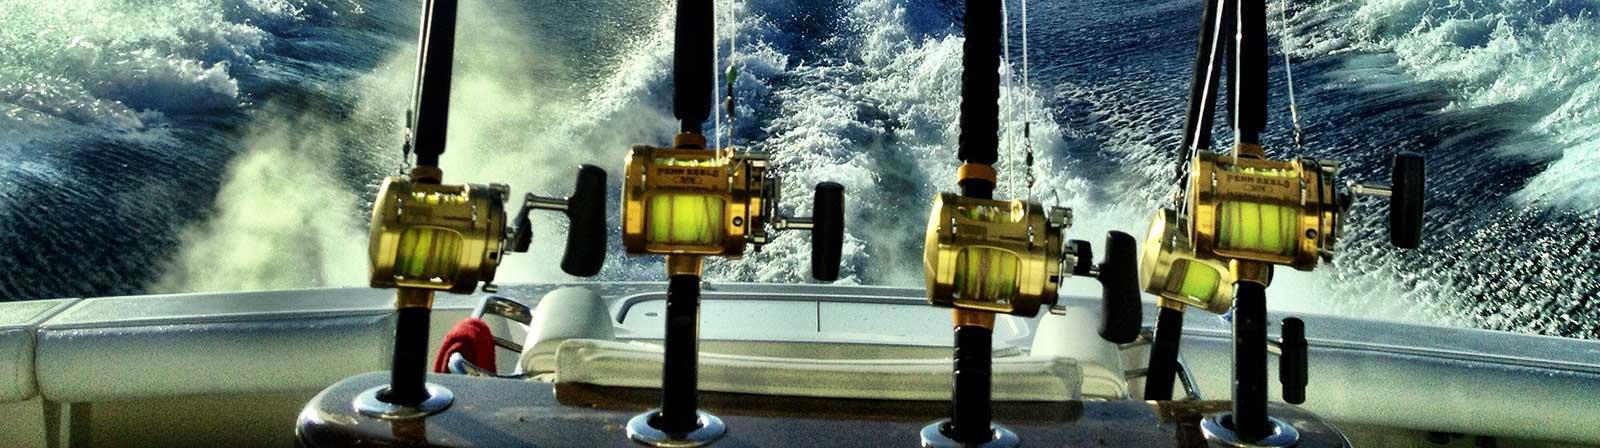 fishing charters gold coast